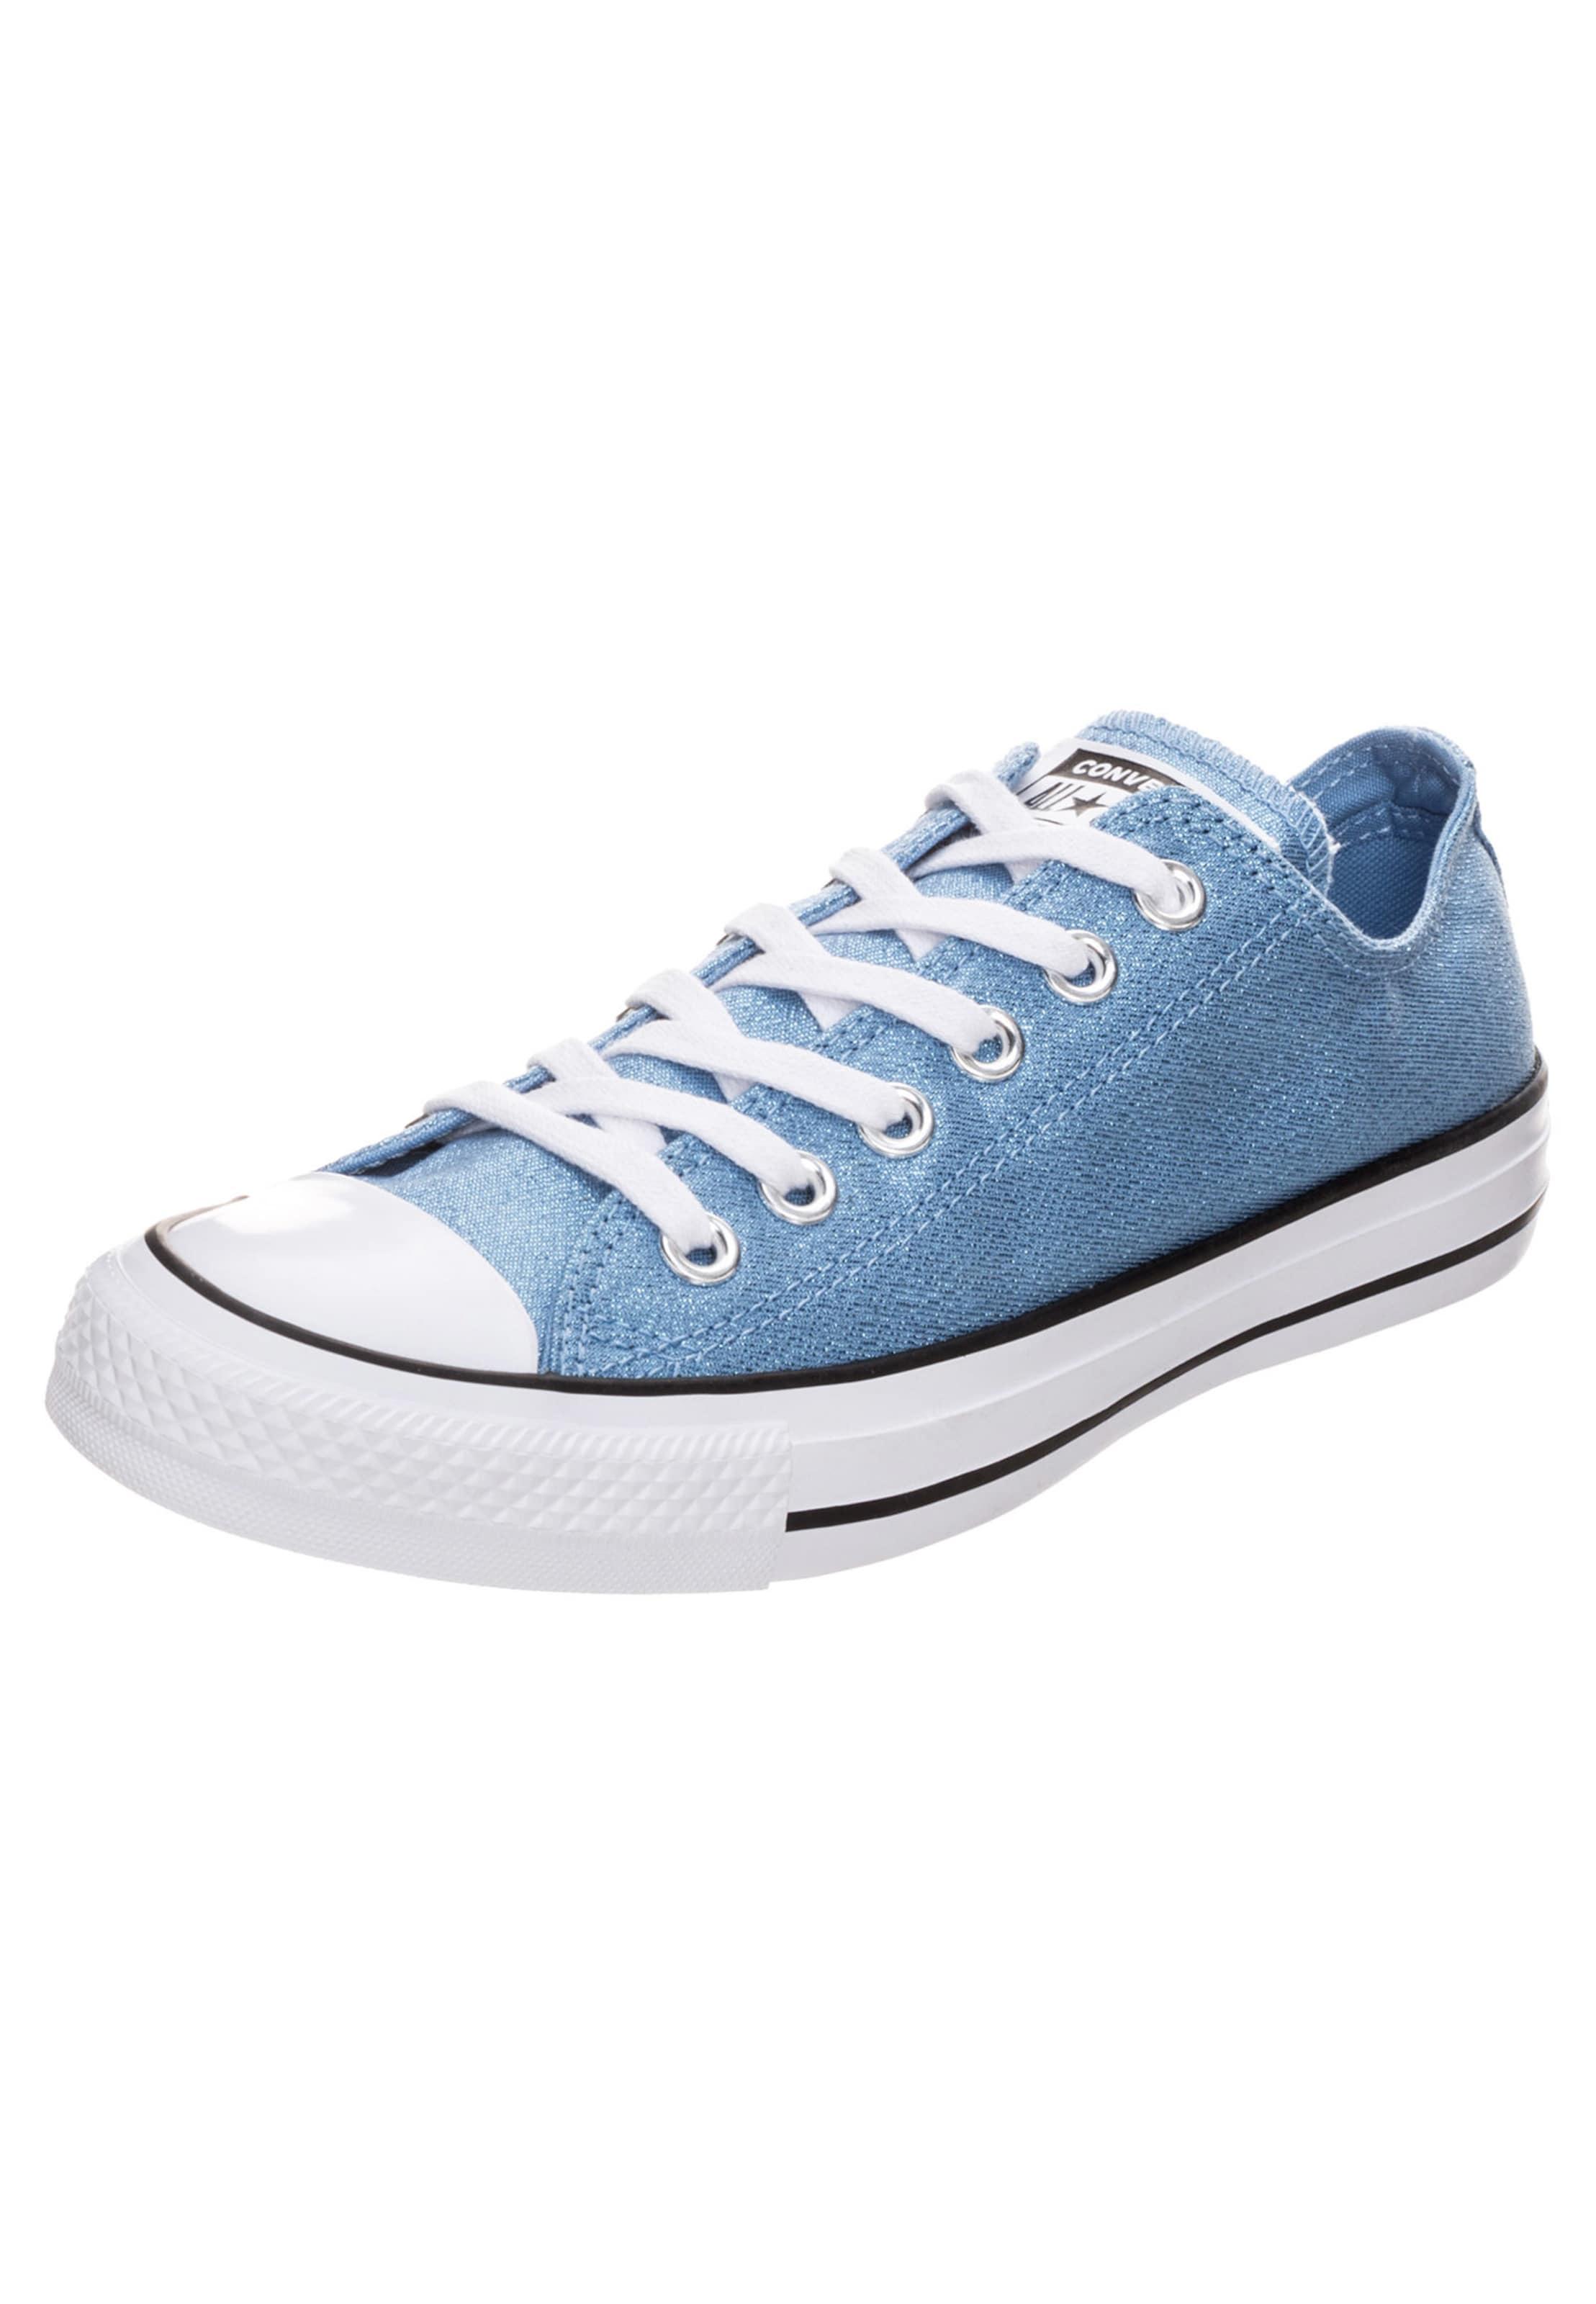 Basses Star En RoiBlanc Converse 'all Baskets Ox' Bleu 8wnPk0XON